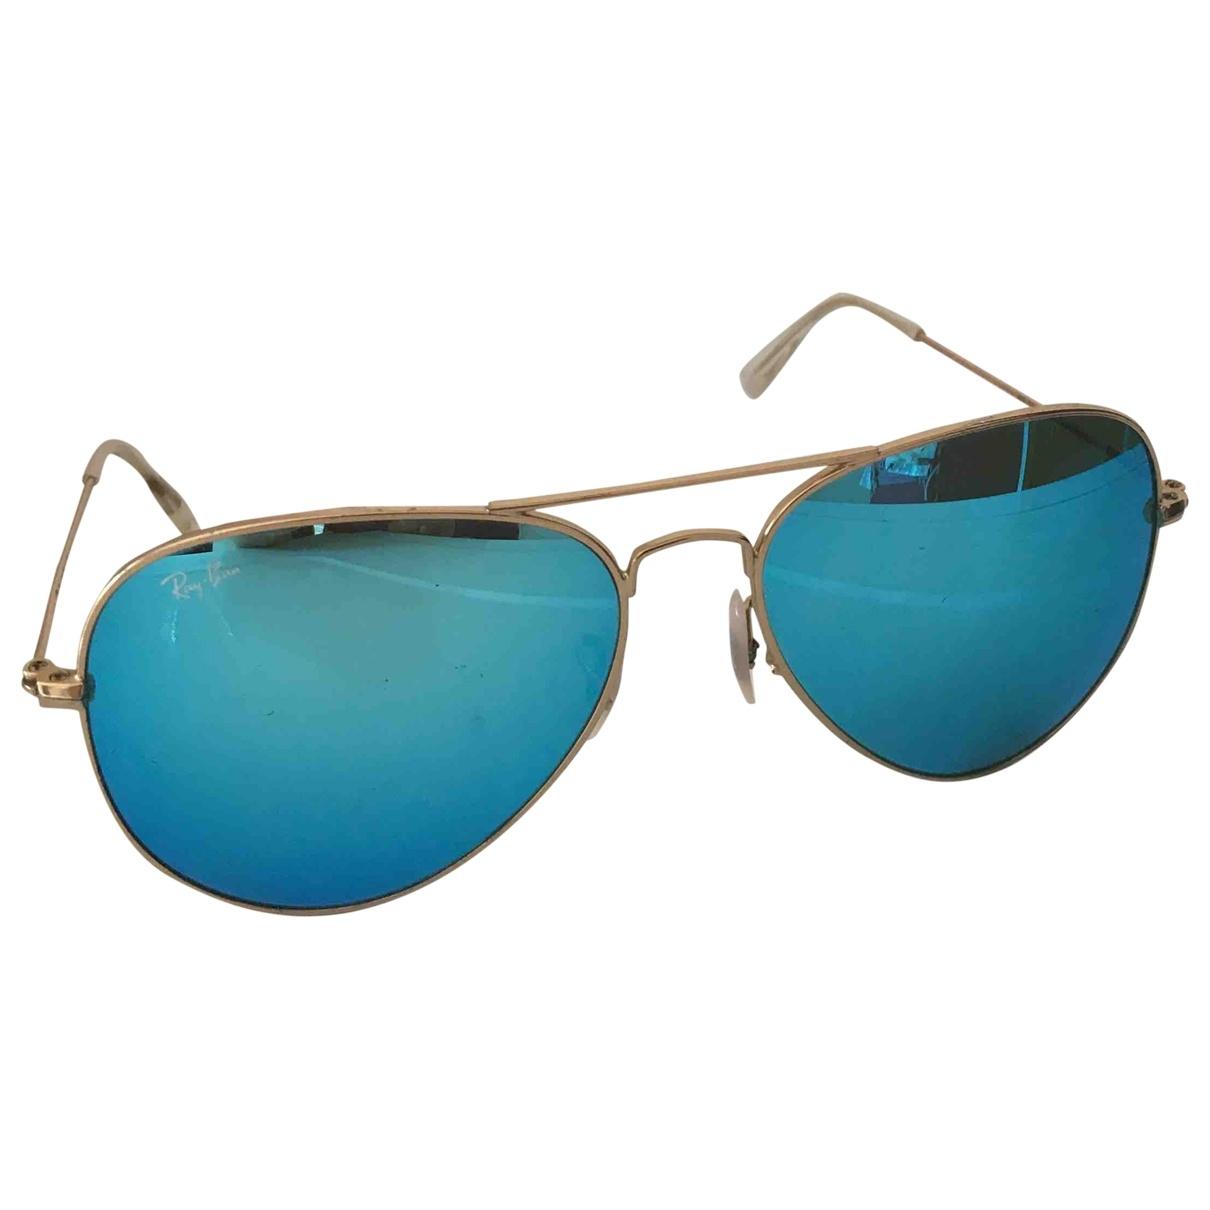 Ray-ban \N Turquoise Metal Sunglasses for Women \N